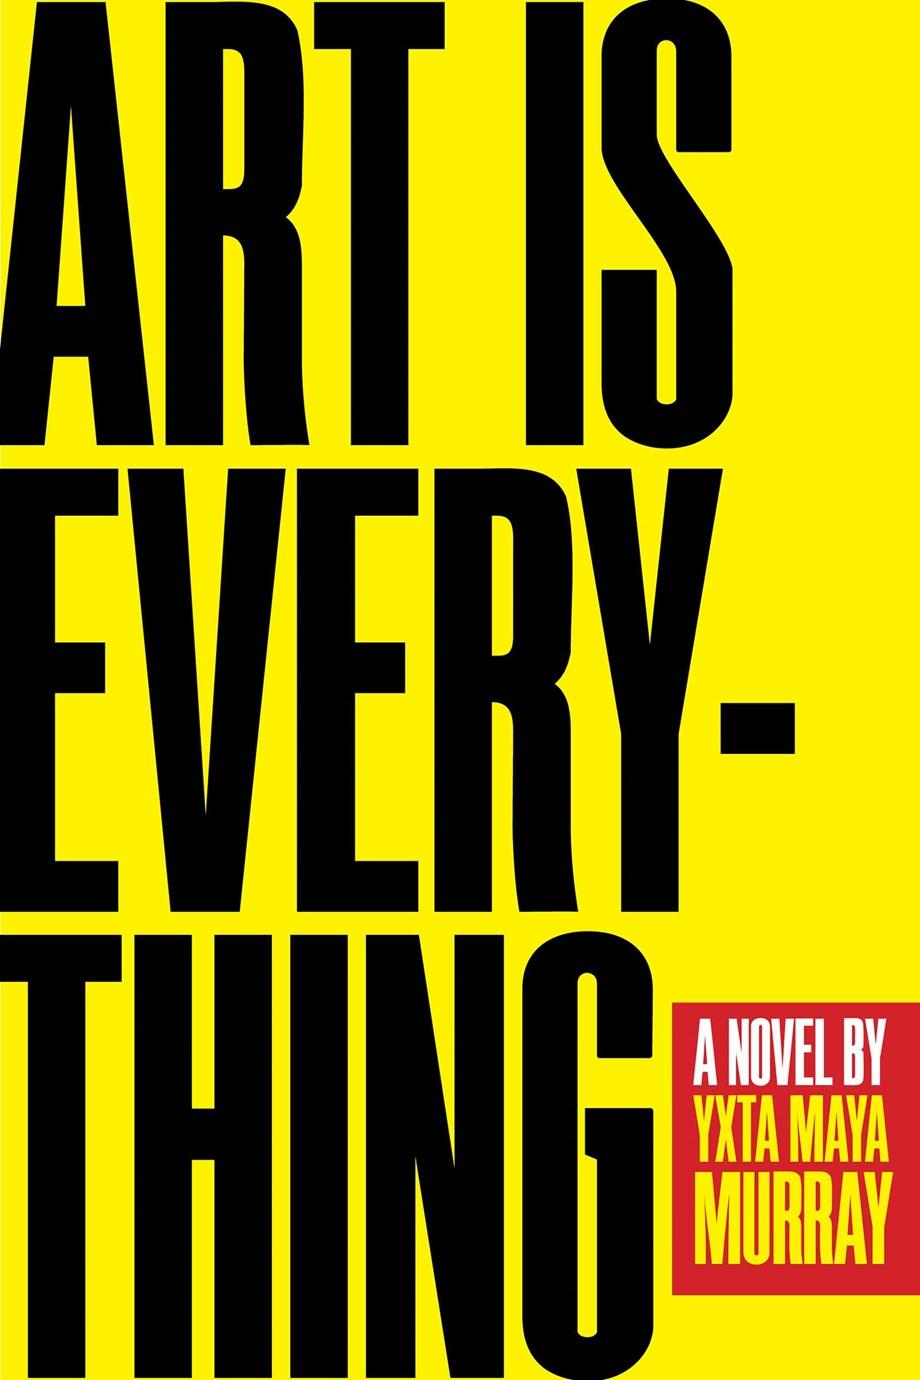 ART IS EVERYTHING - By Yxta Maya Murray